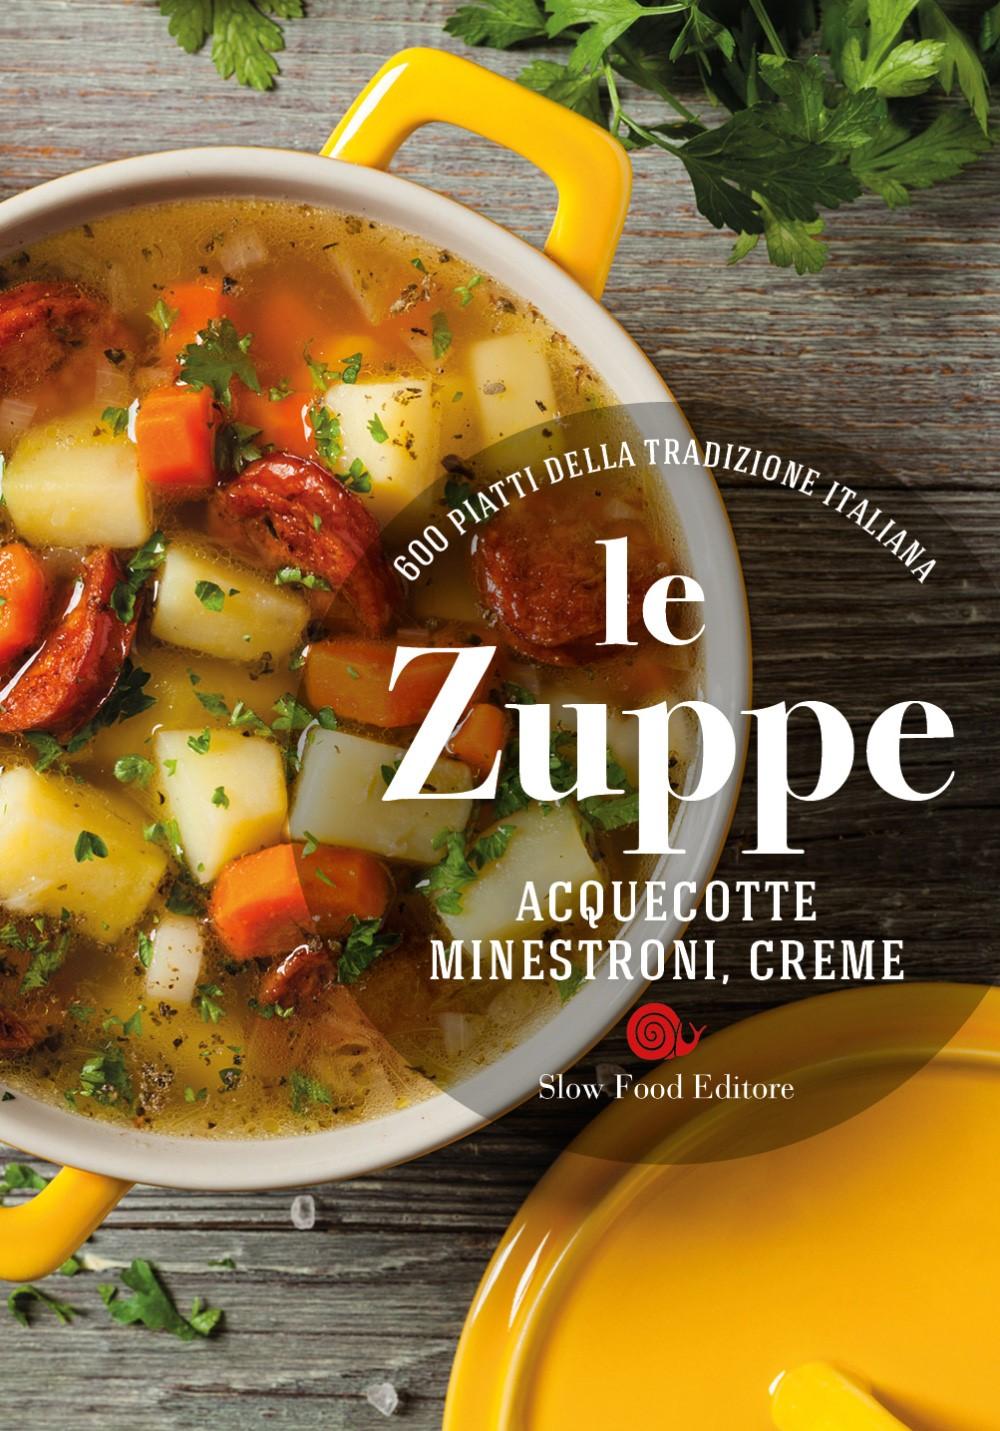 Le zuppe. Acquecotte, minestroni, creme